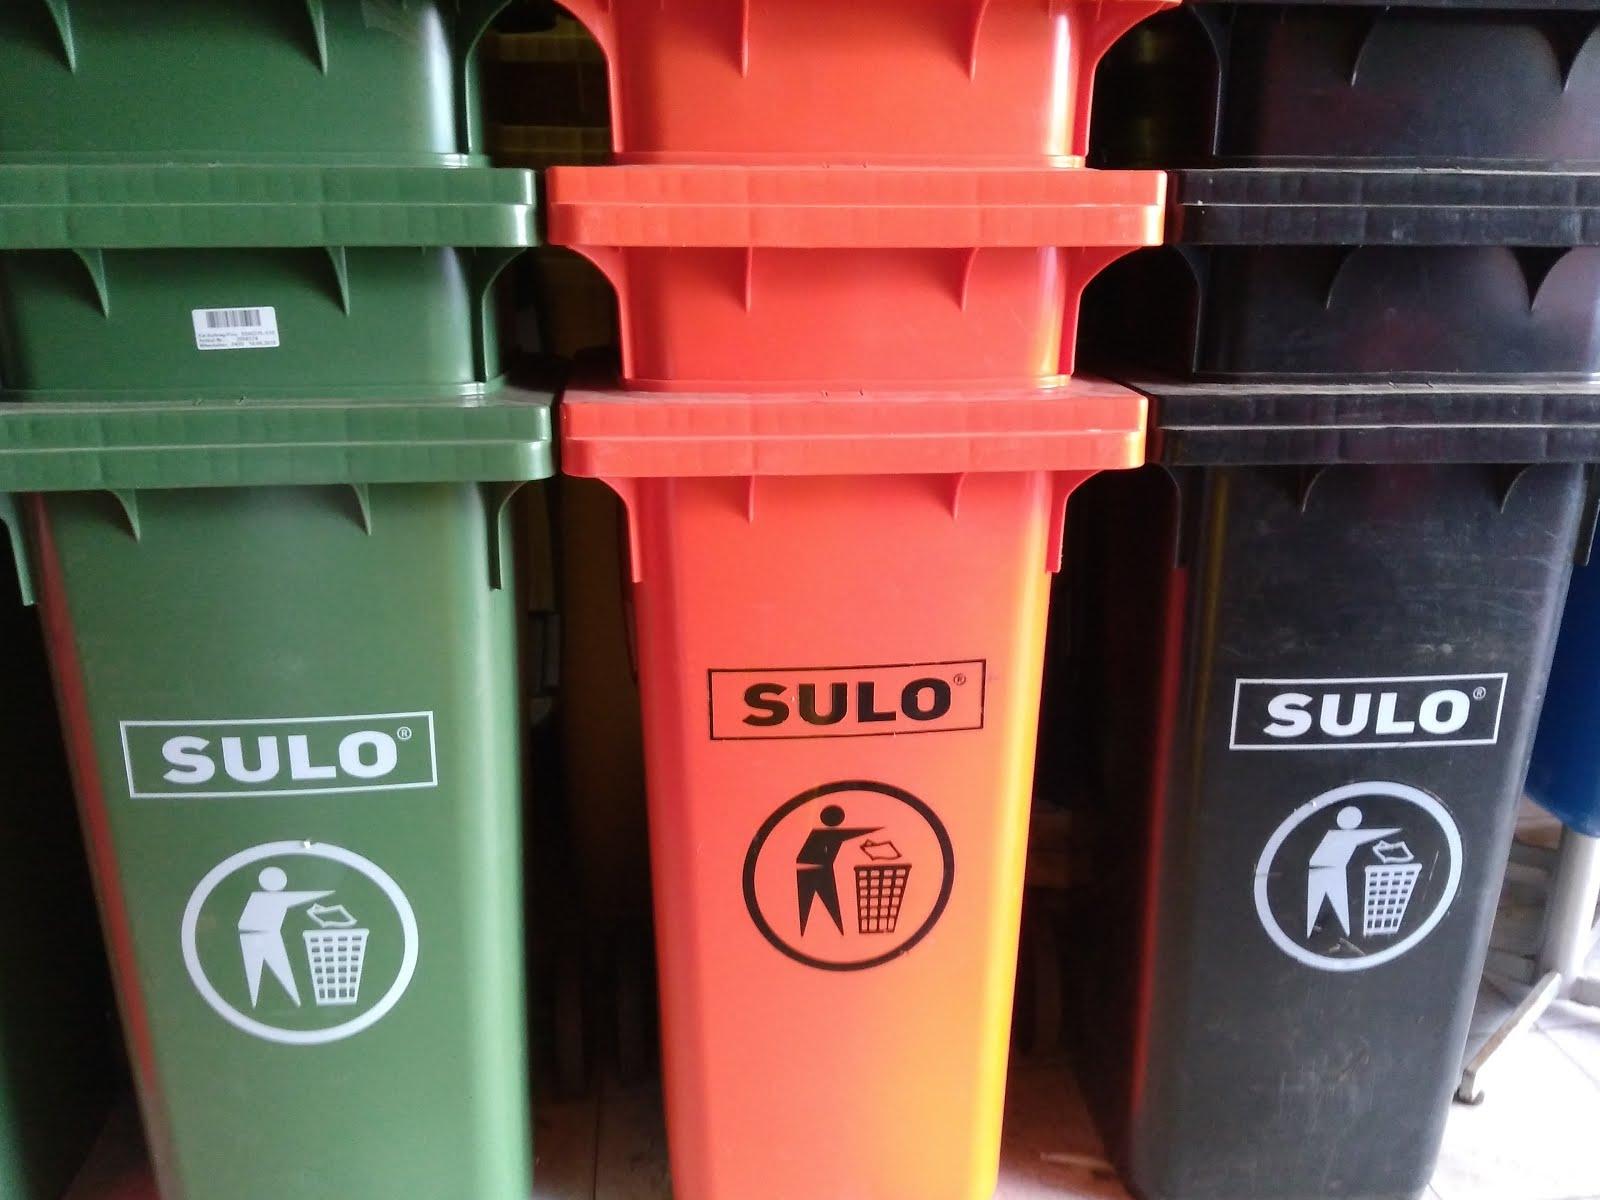 Tong Sampah SULO 120 liter